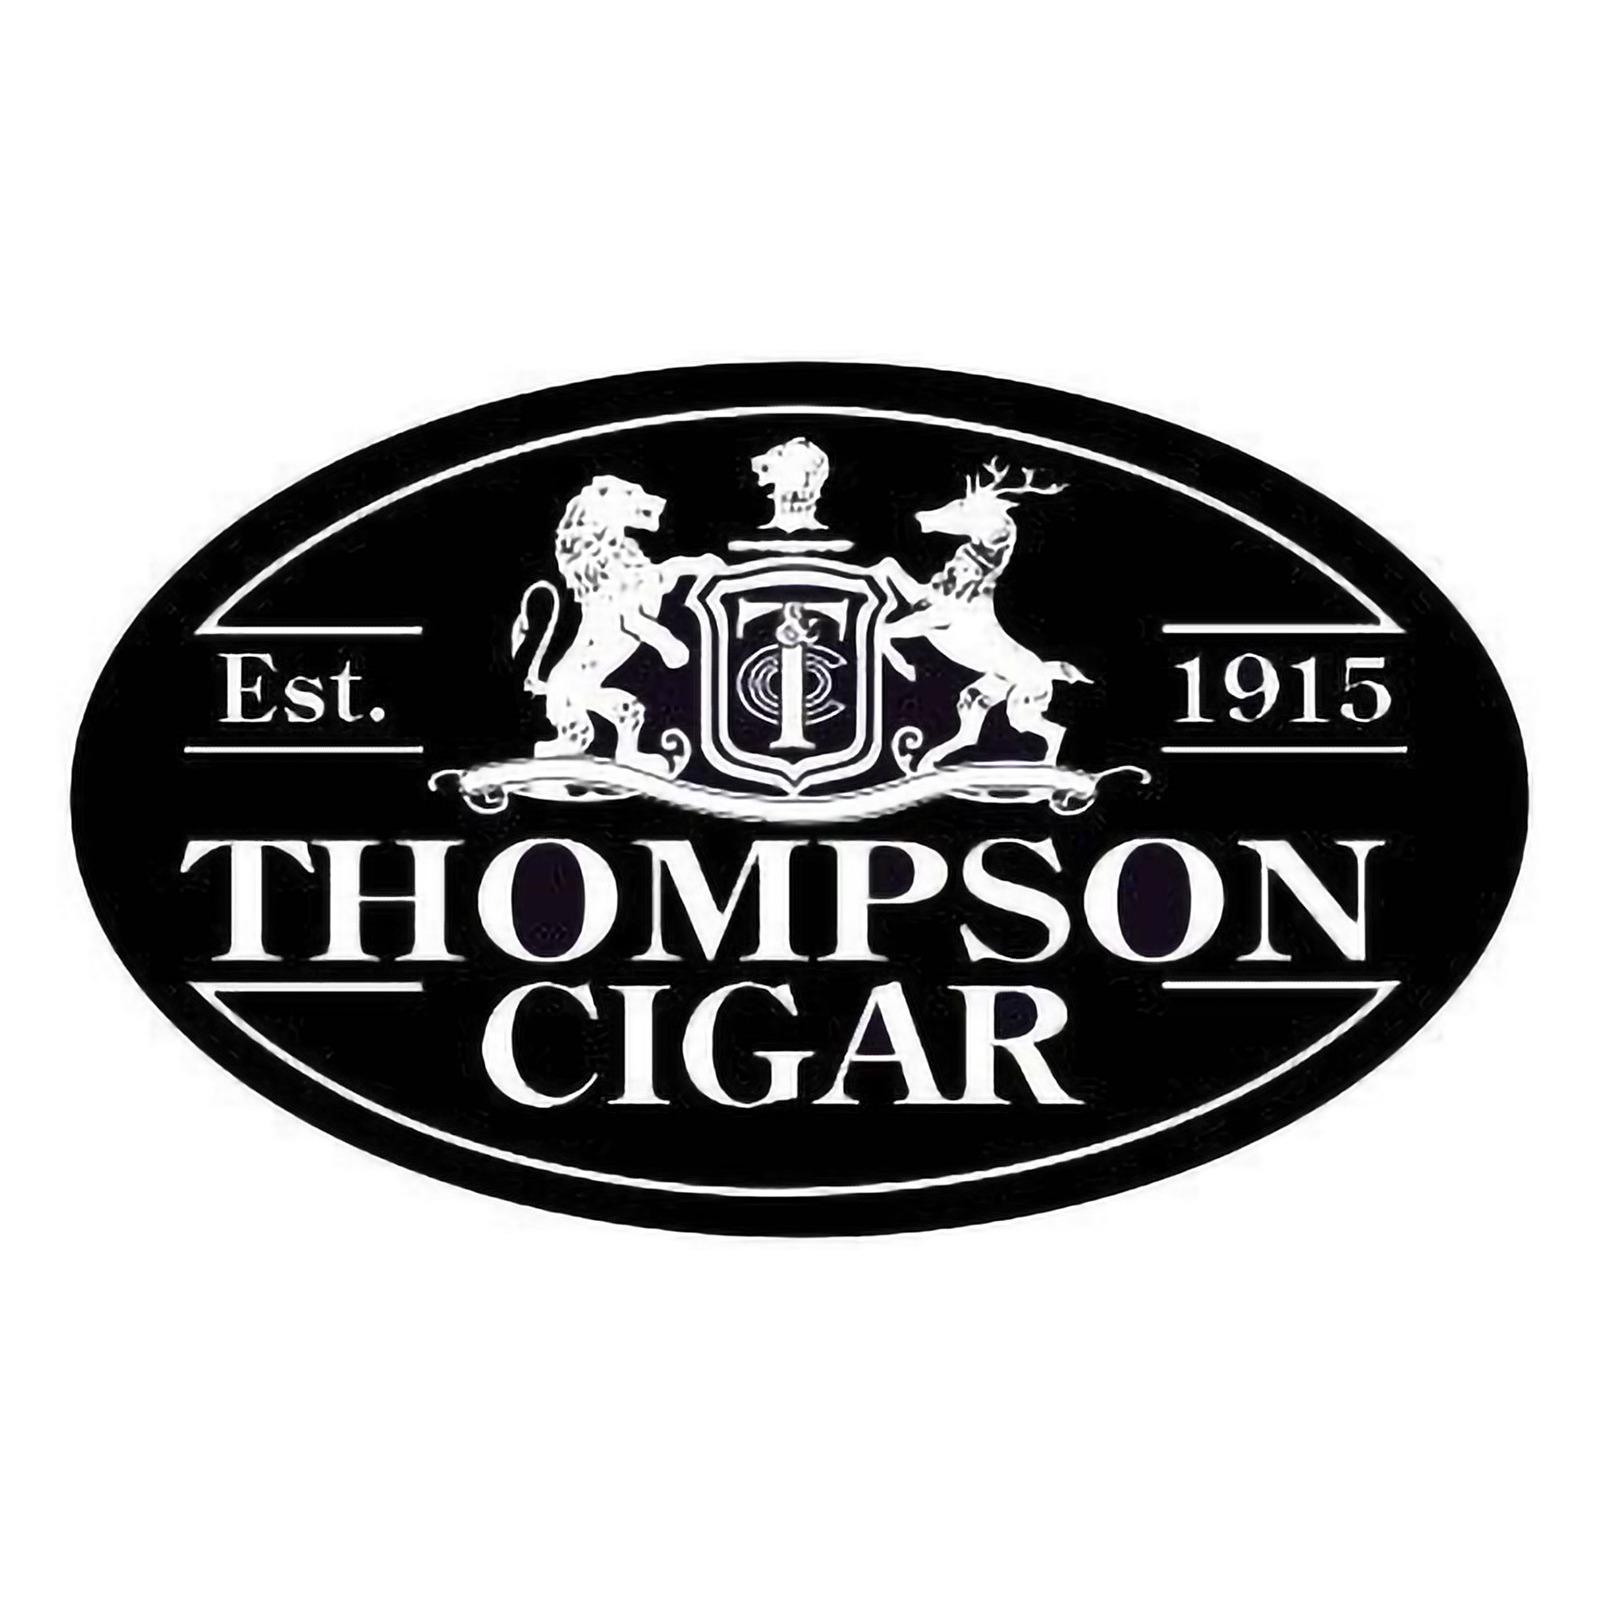 Thompson Cigar - Bethlehem, PA 18015 - (484)281-1001 | ShowMeLocal.com